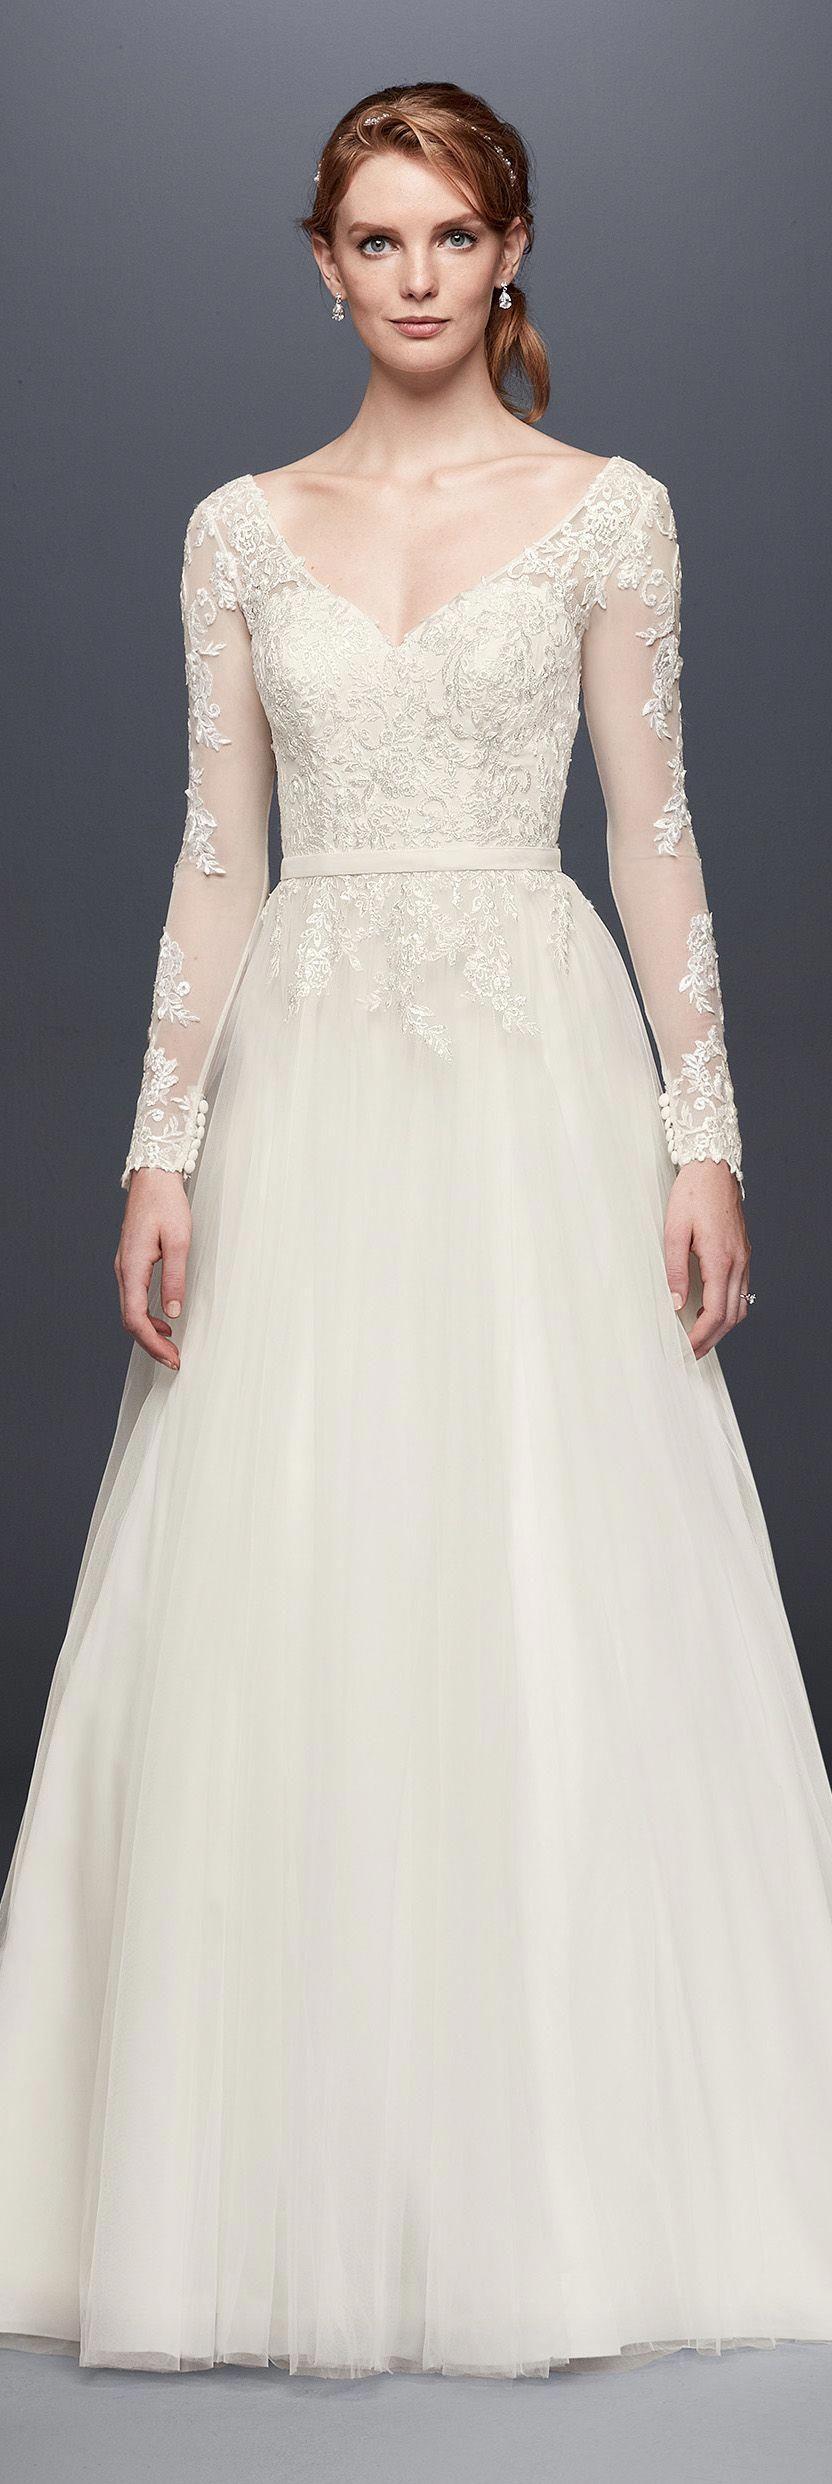 Long sleeve wedding dress with low back davids bridal